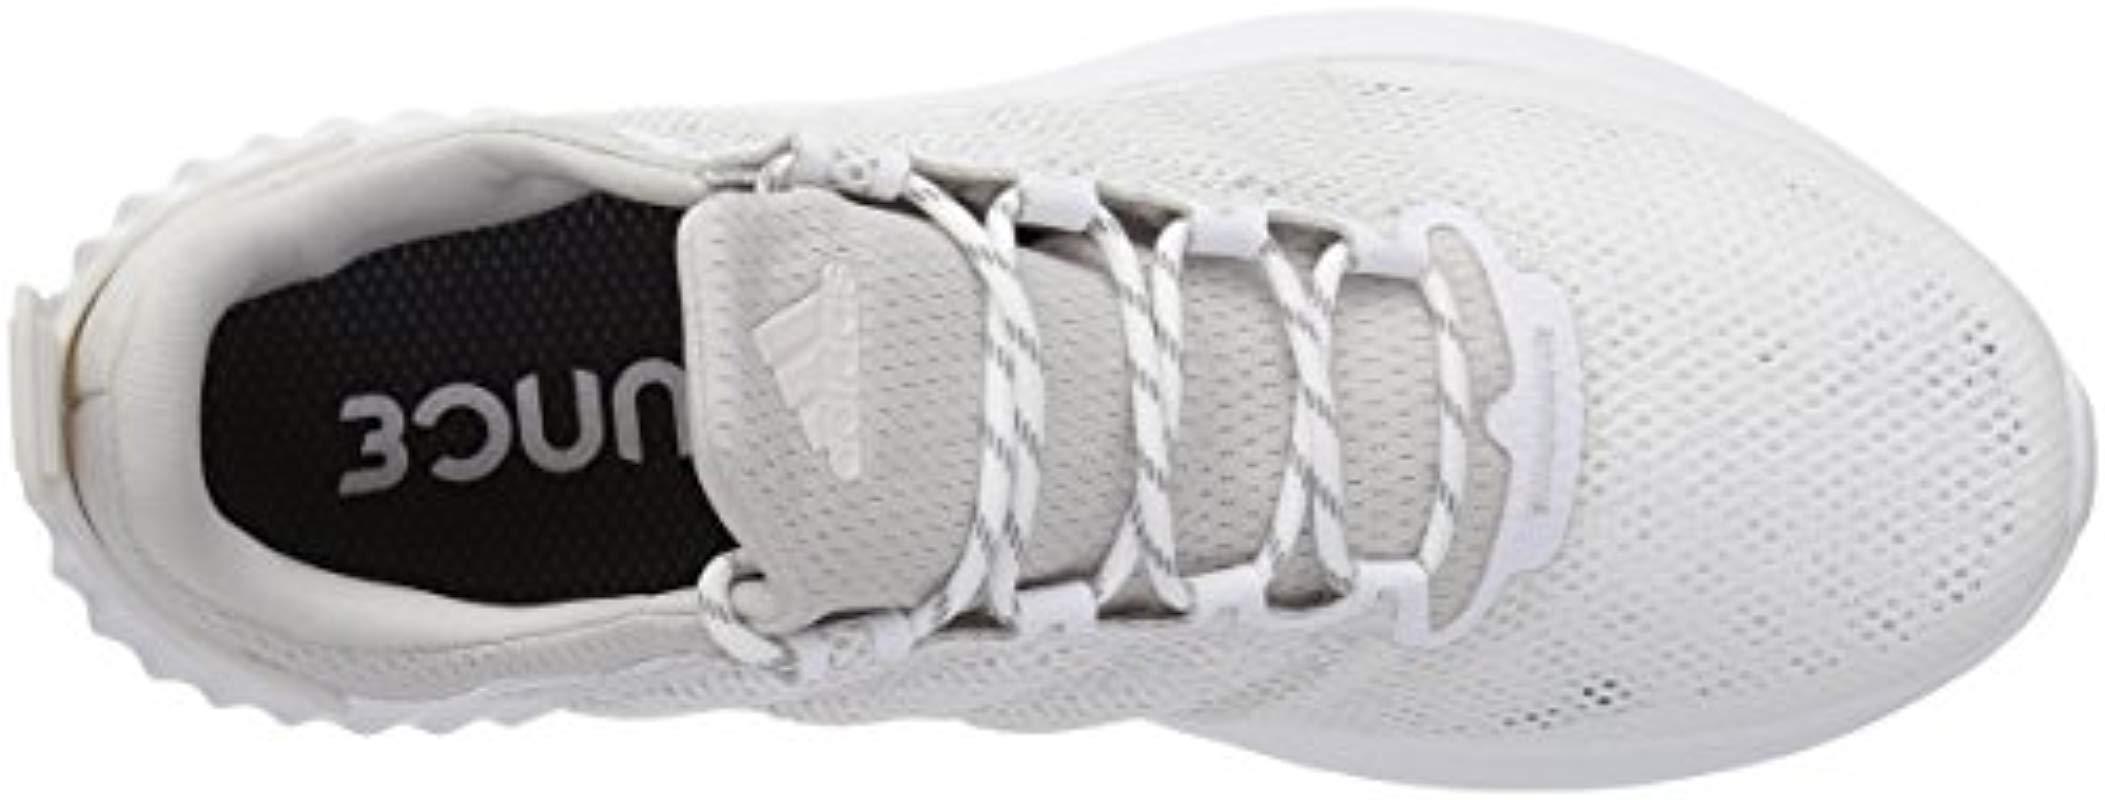 53532343c49b3 Adidas Originals - White Alphabounce Cr Cc Running Shoe for Men - Lyst.  View fullscreen